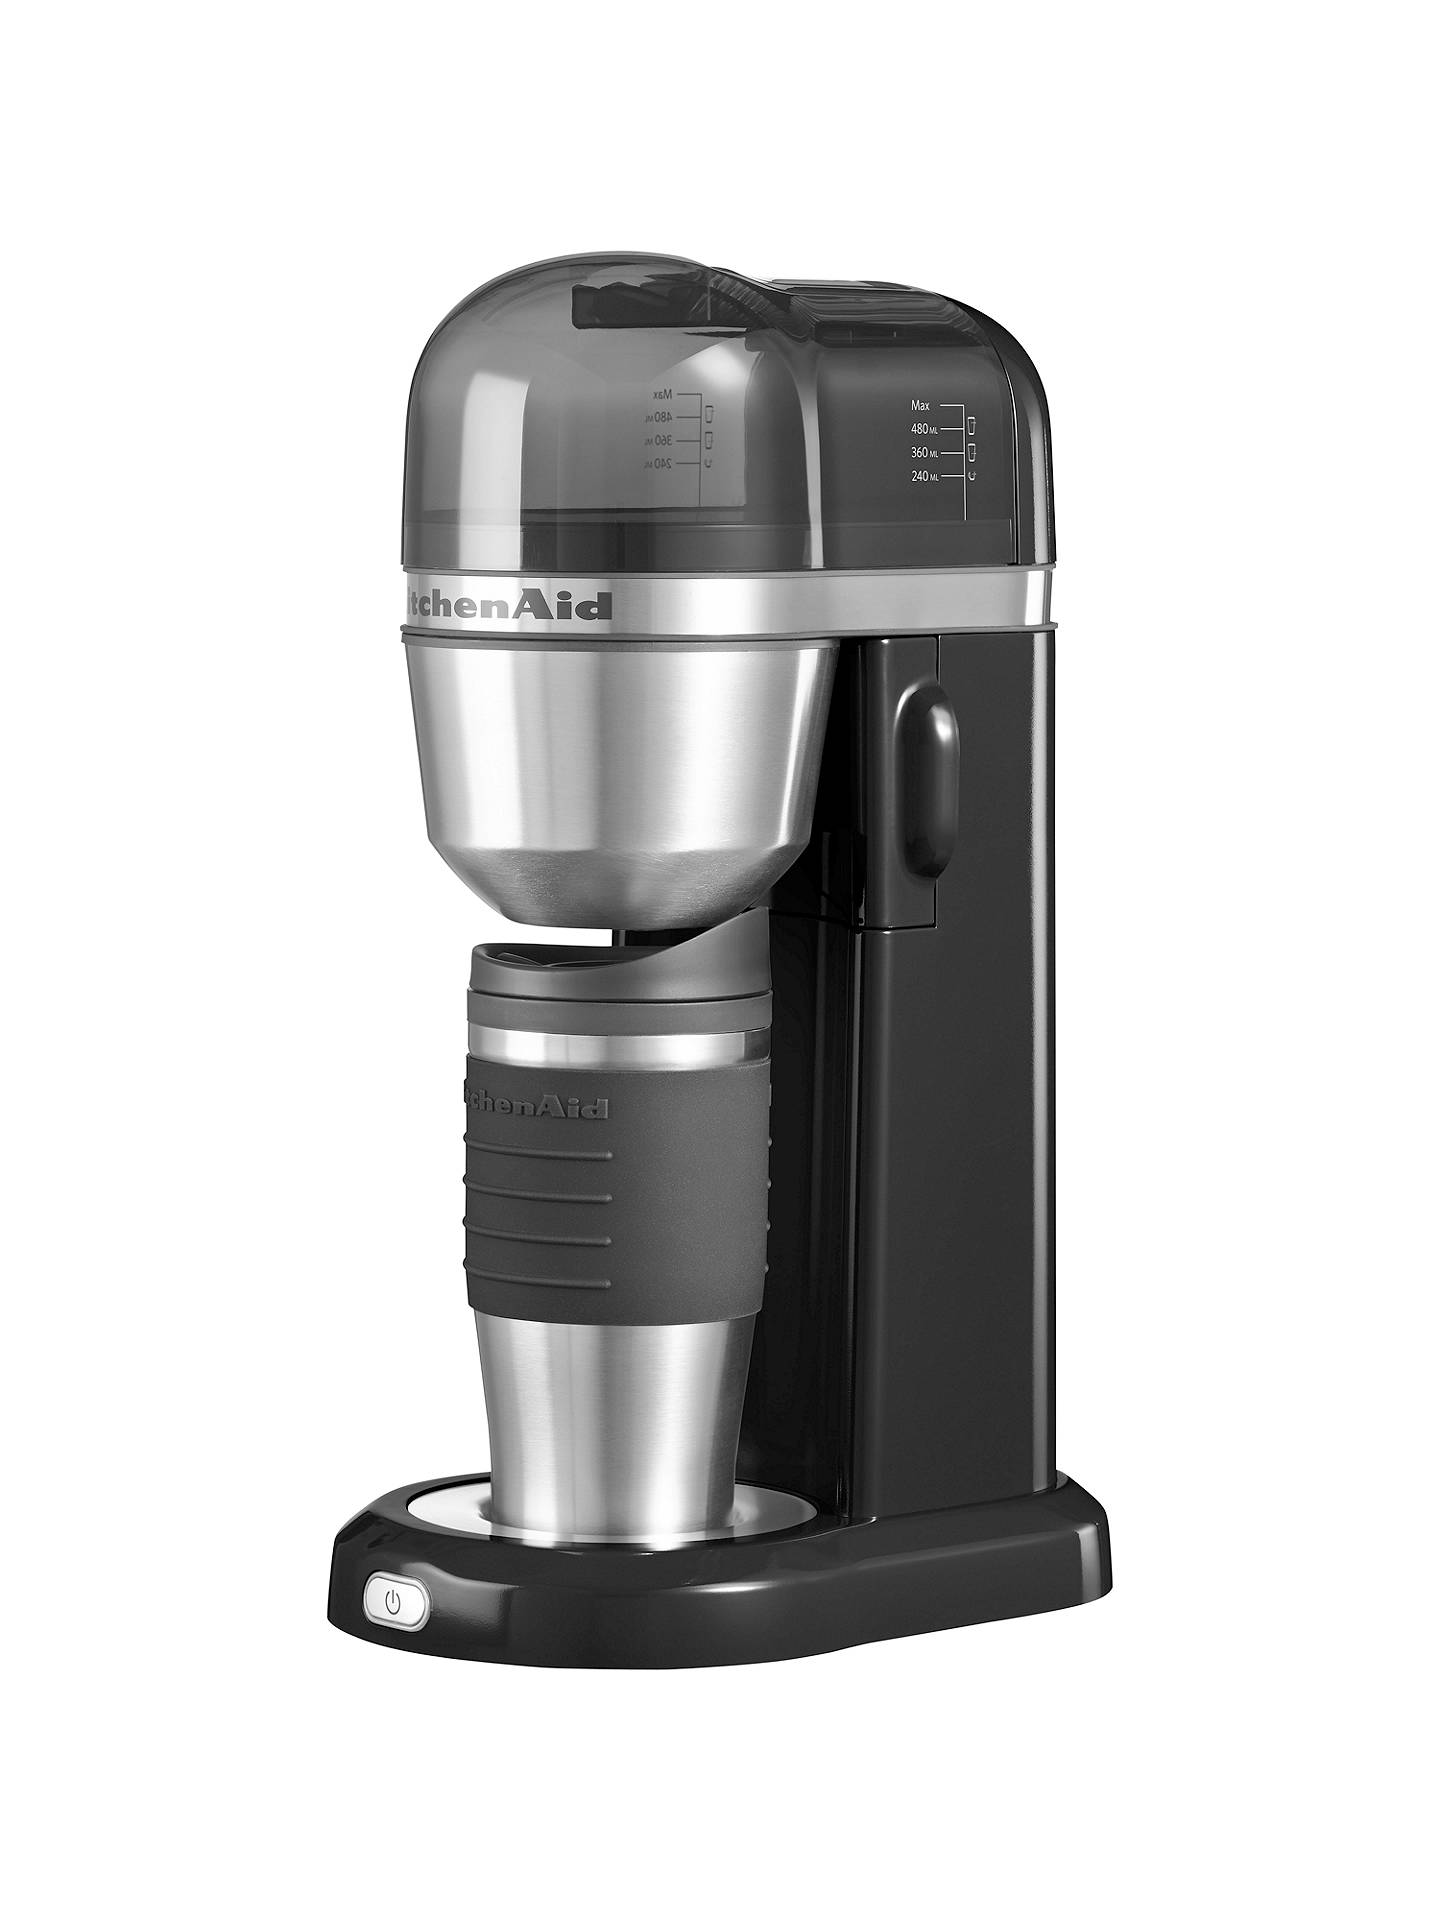 Kitchenaid Personal Filter Coffee Maker At John Lewis Partners